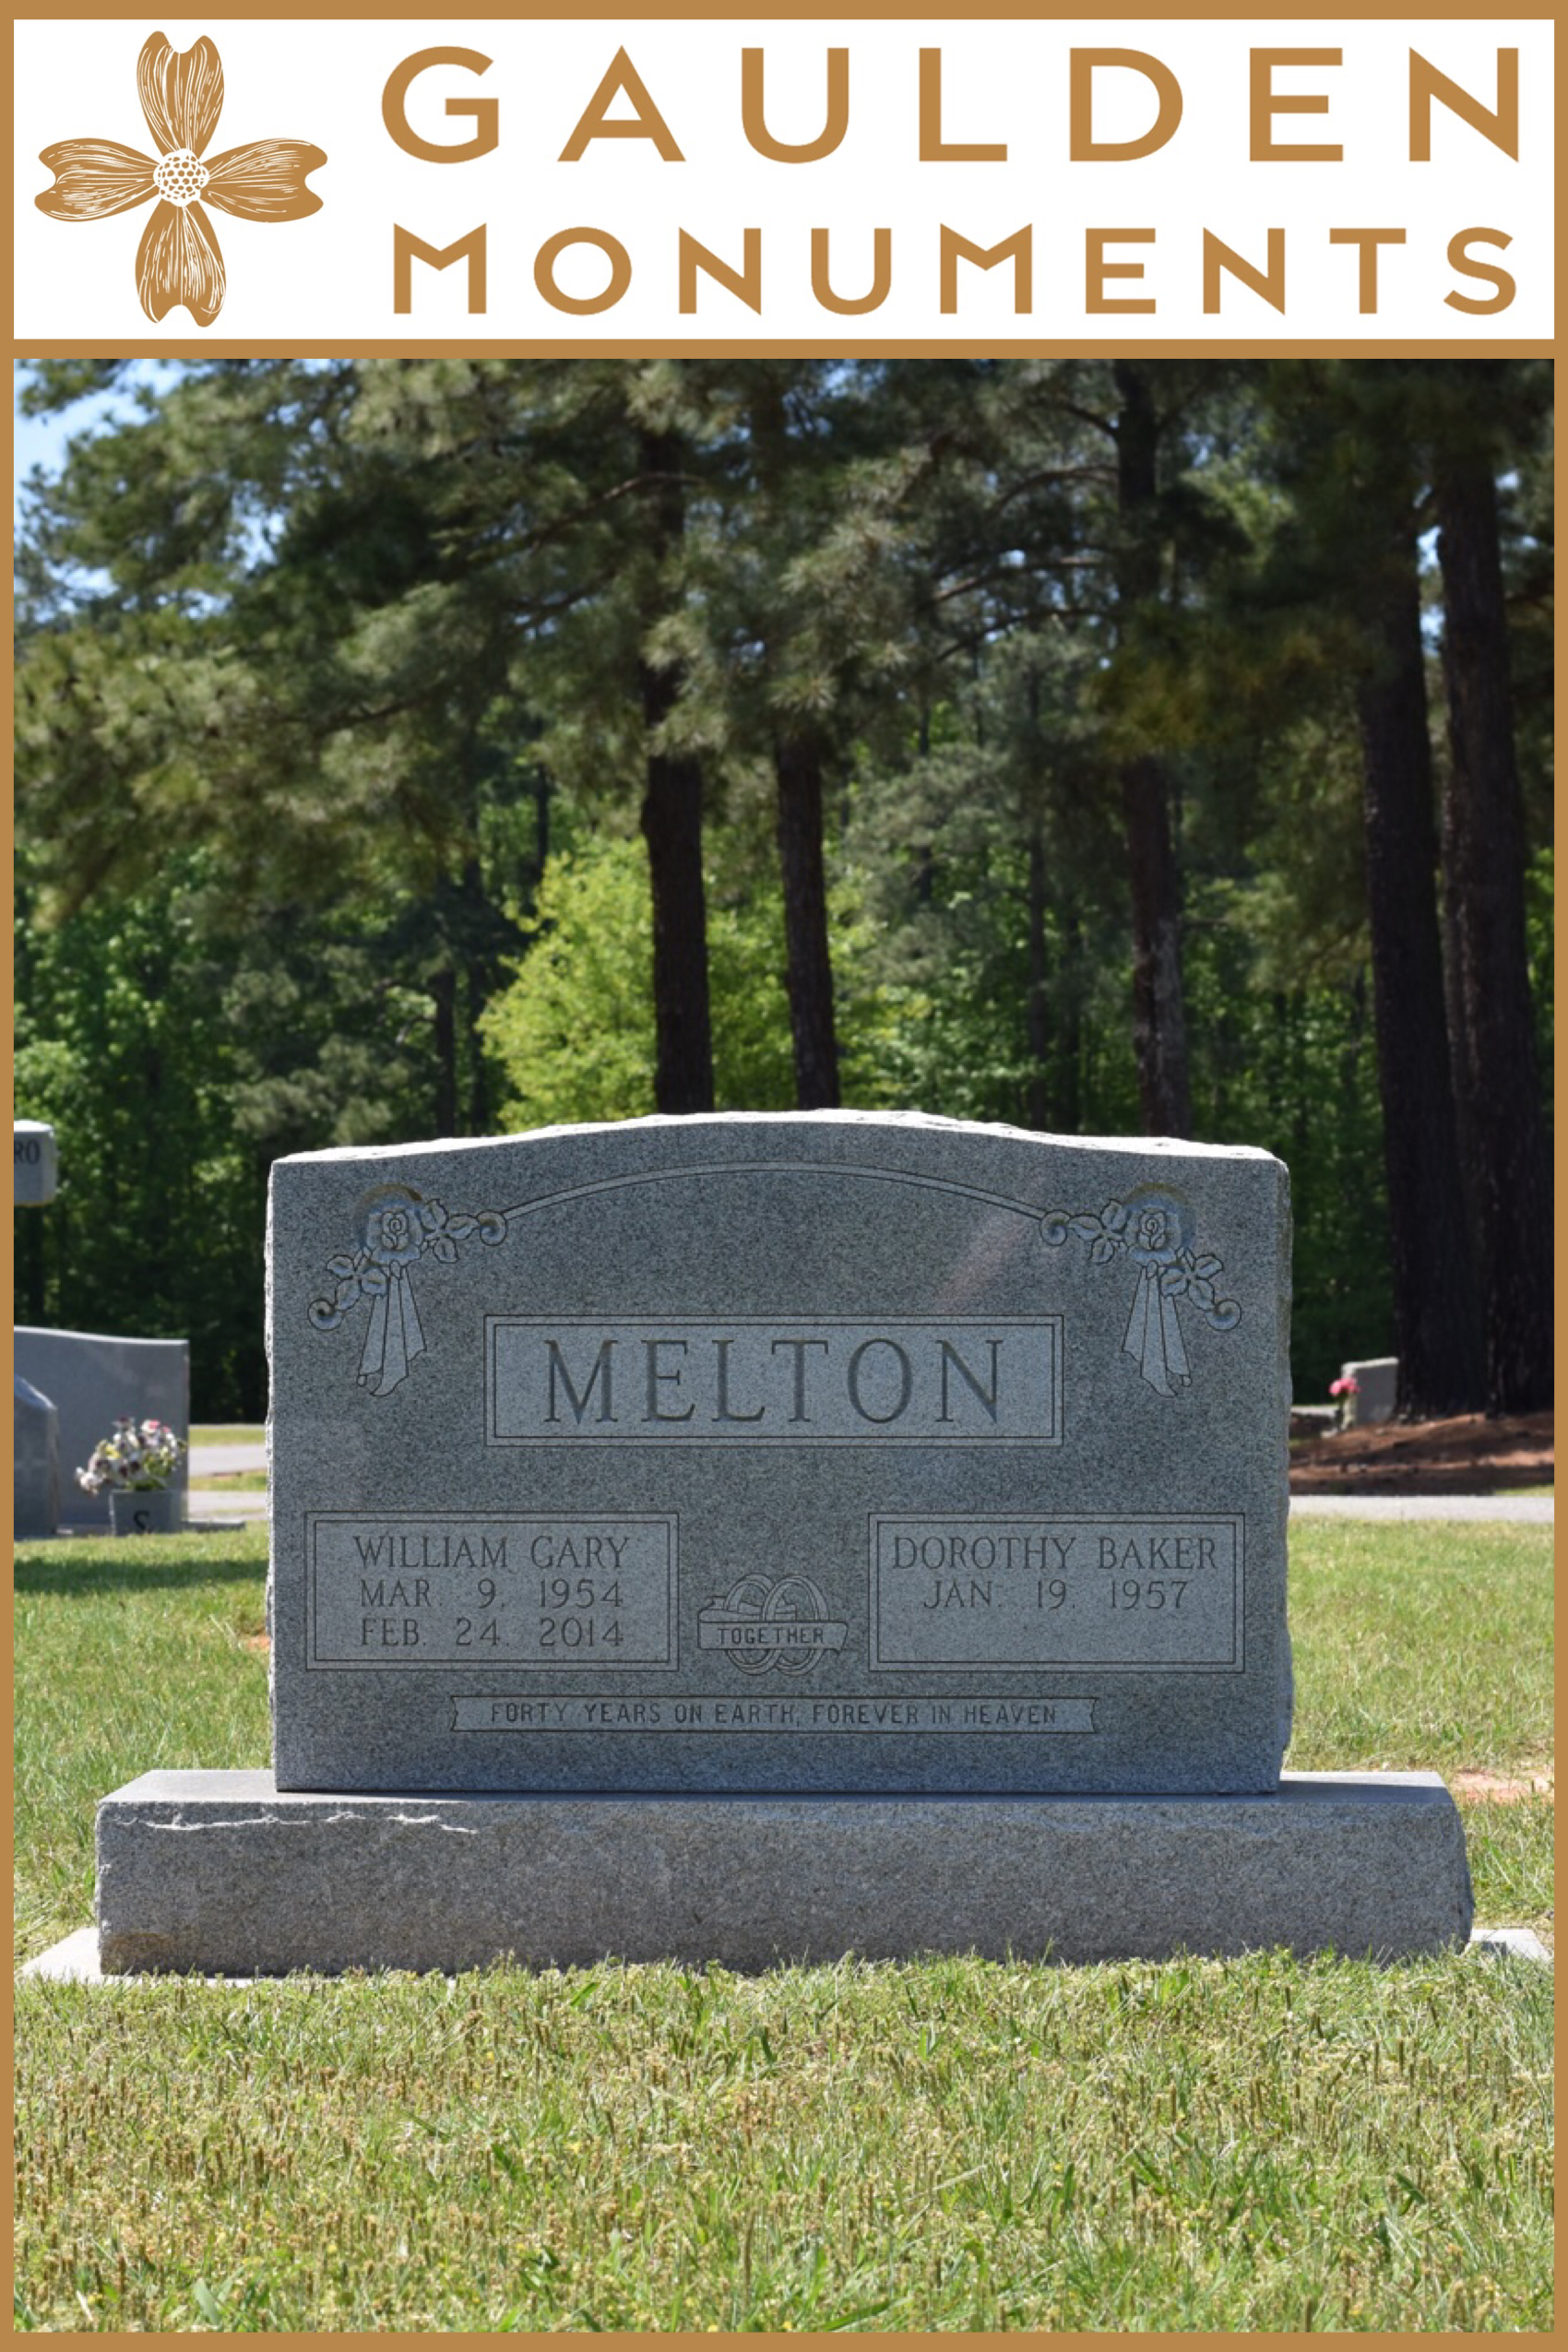 Granite Headstone Gaulden Monuments Granite Headstones Headstones Monument